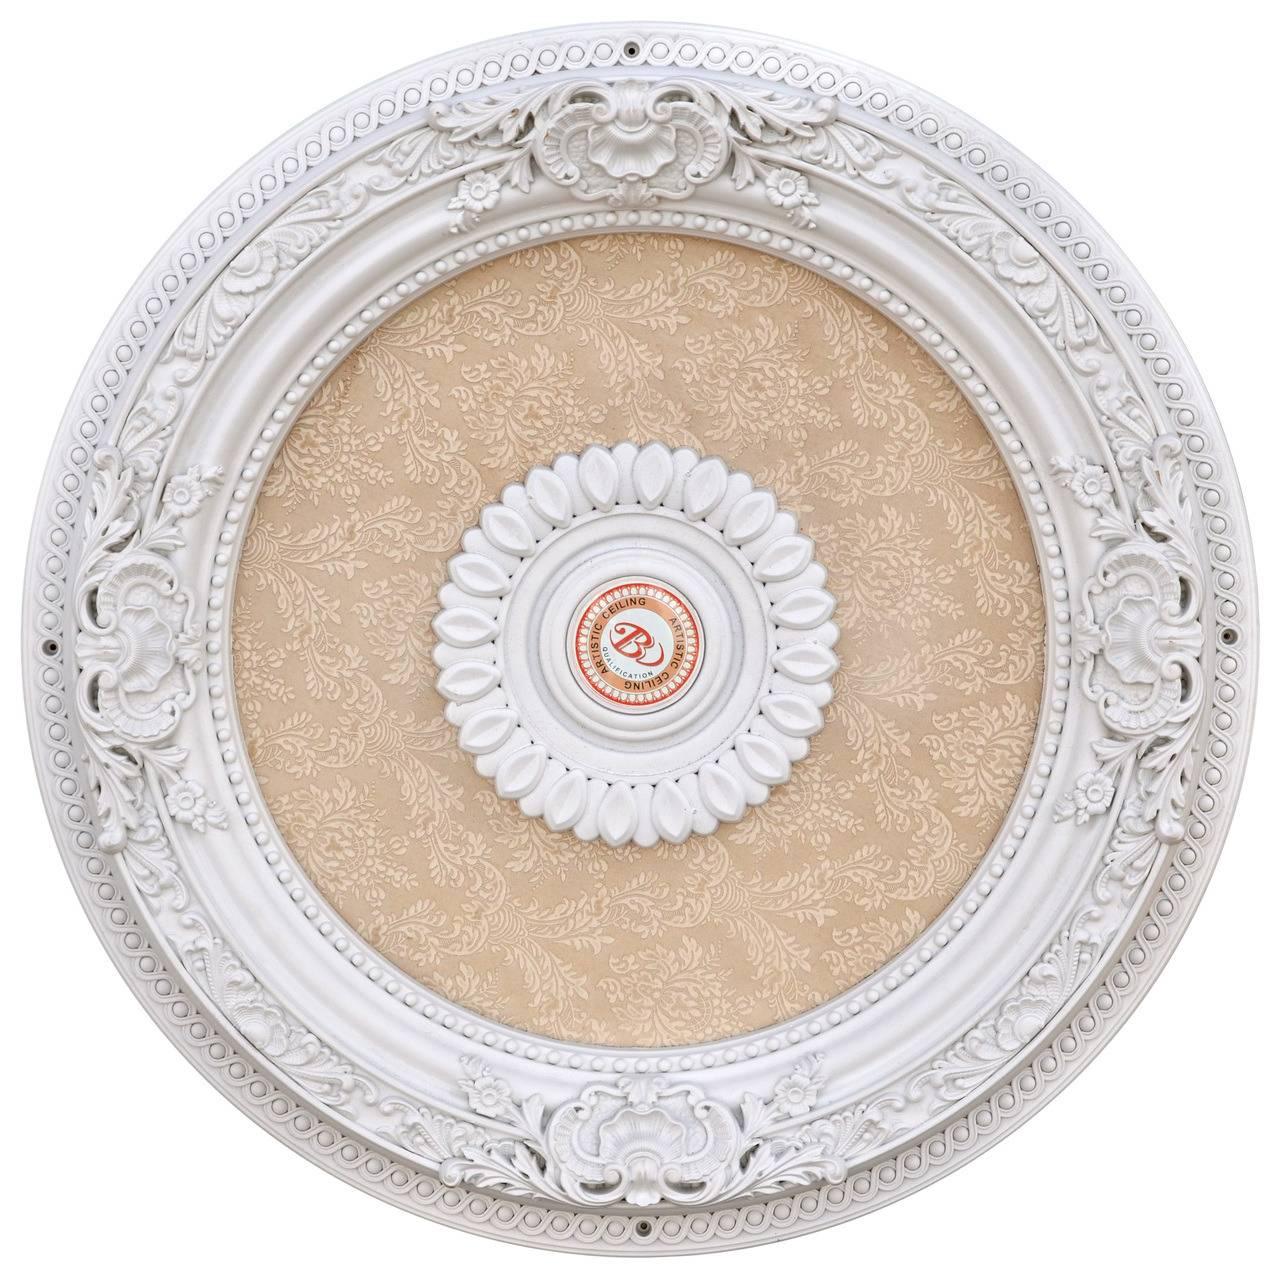 Banruo Hot Sale Artistic Polystyrene Decorative Ceiling Medallions For Interior Decor